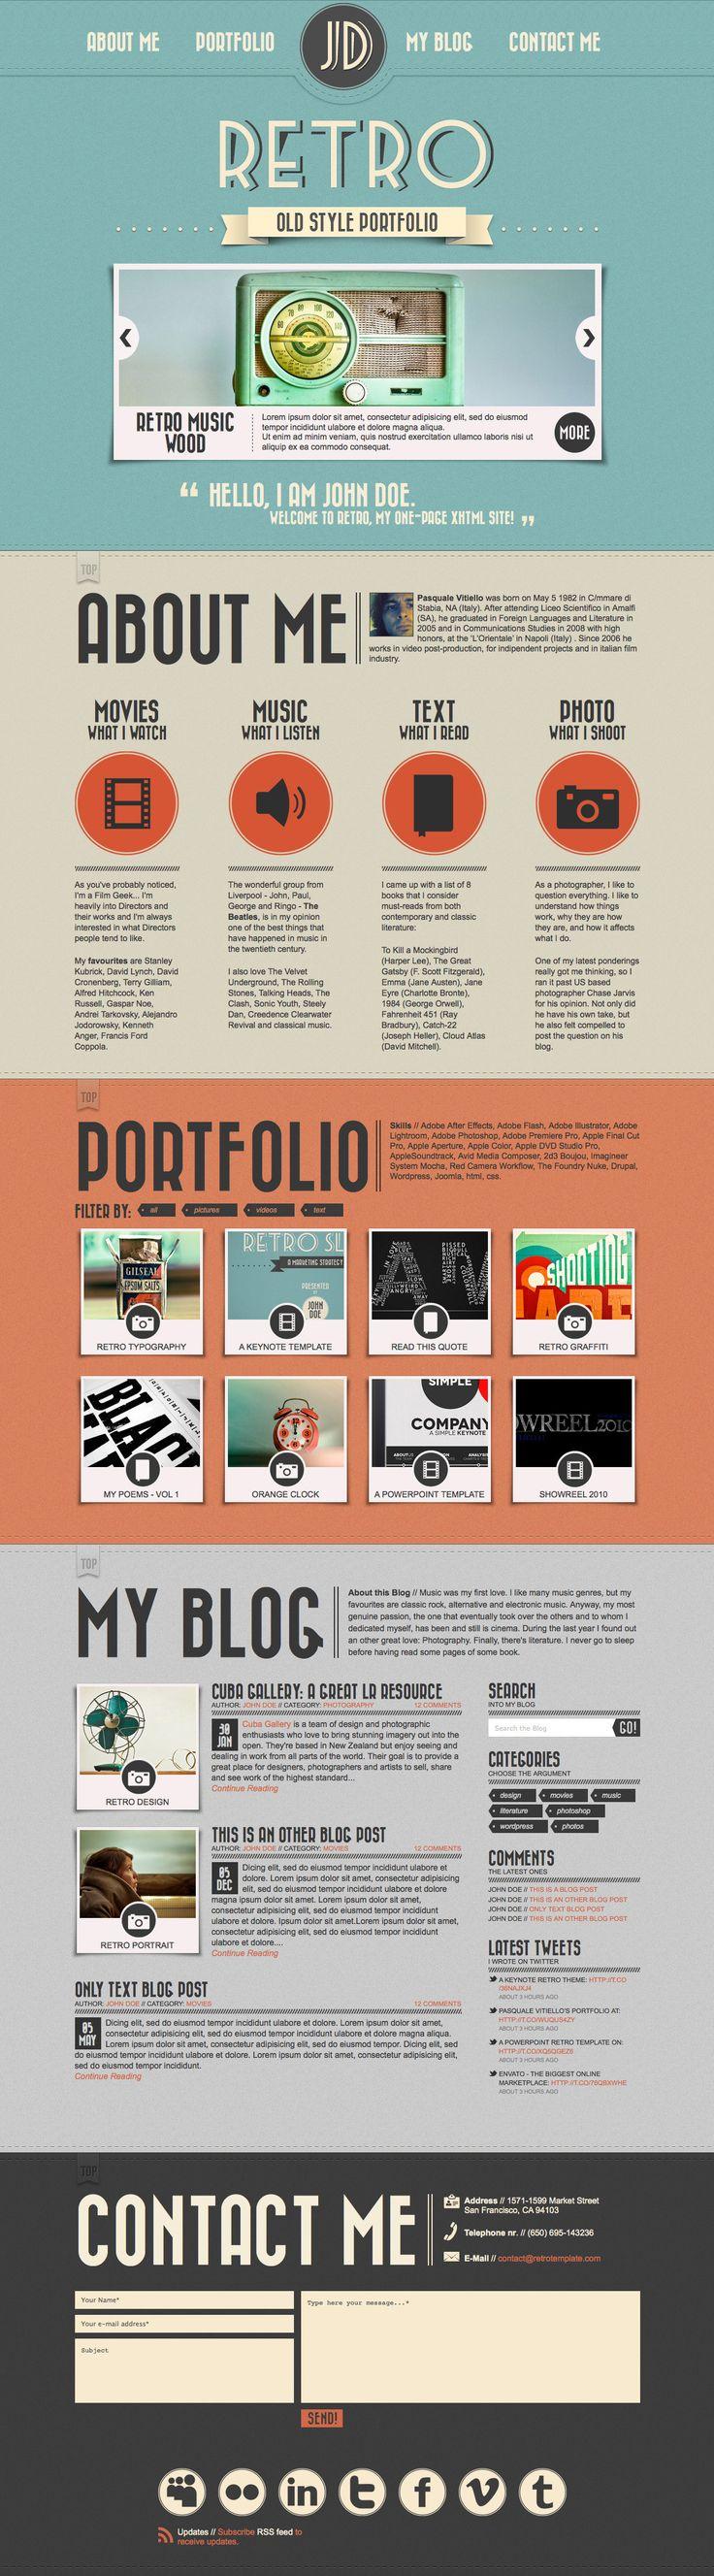 Retro Portfolio - Attractive and Eye catching One Page Vintage Wordpress Theme.